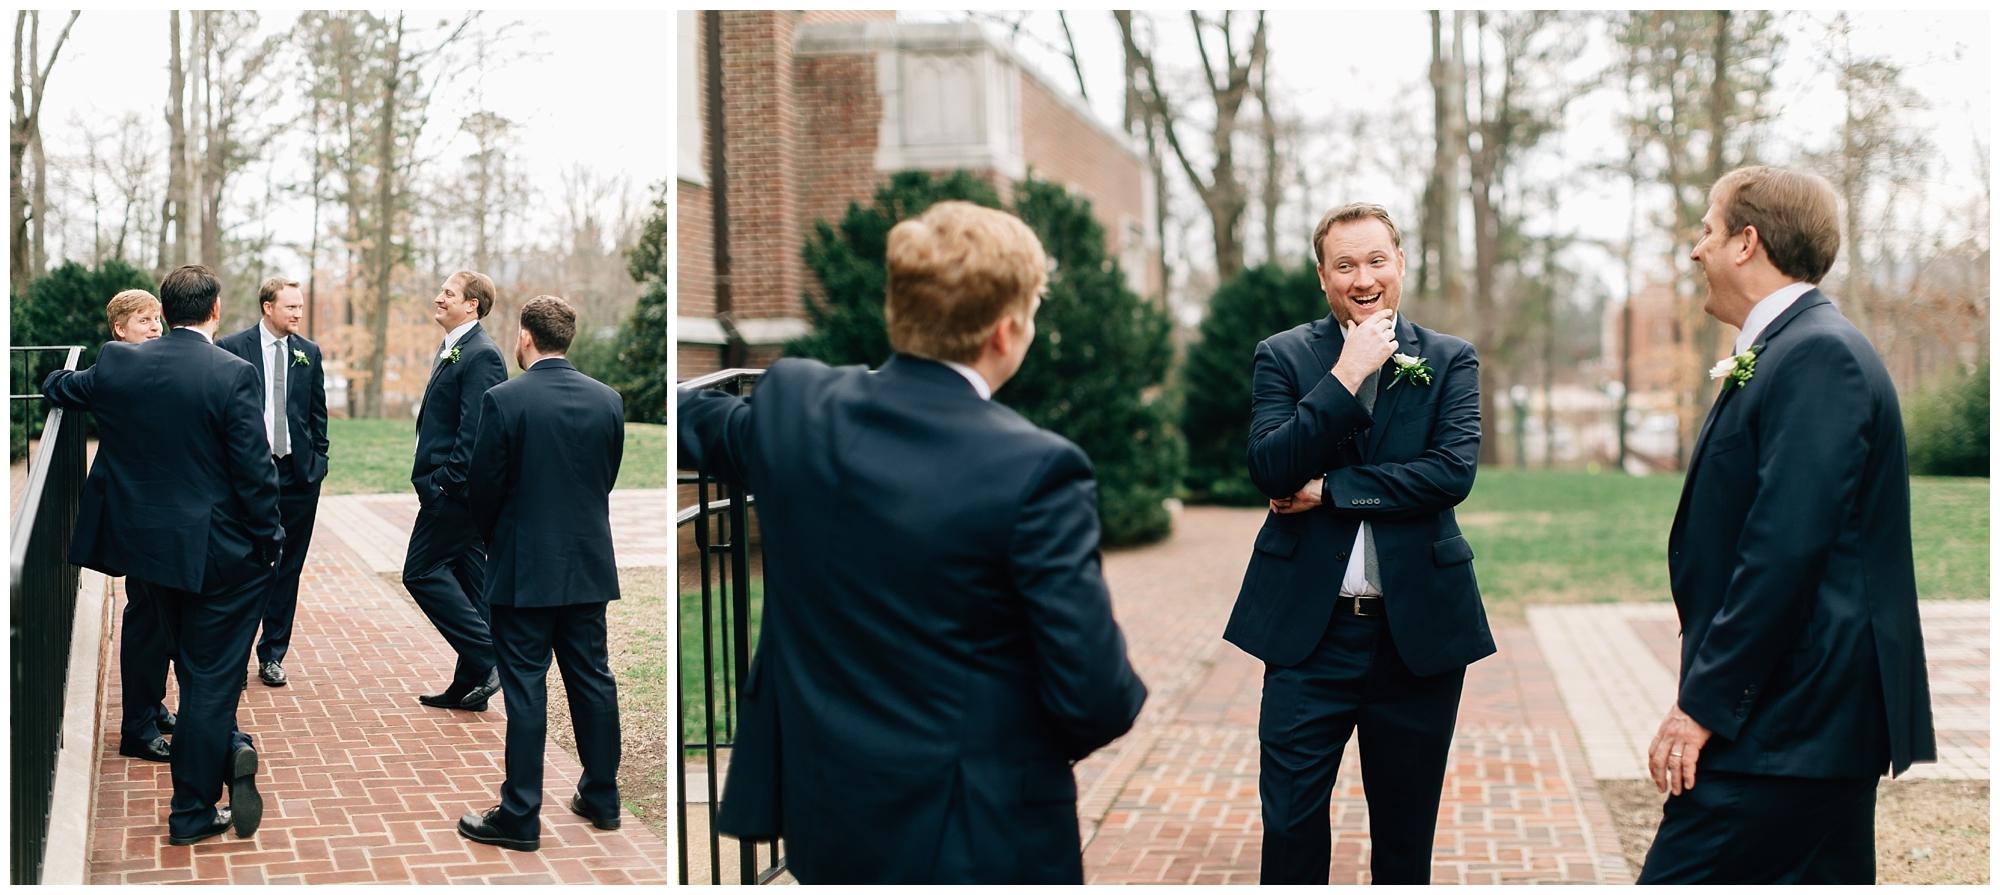 Country-Club-Virginia-Wedding-54.jpg